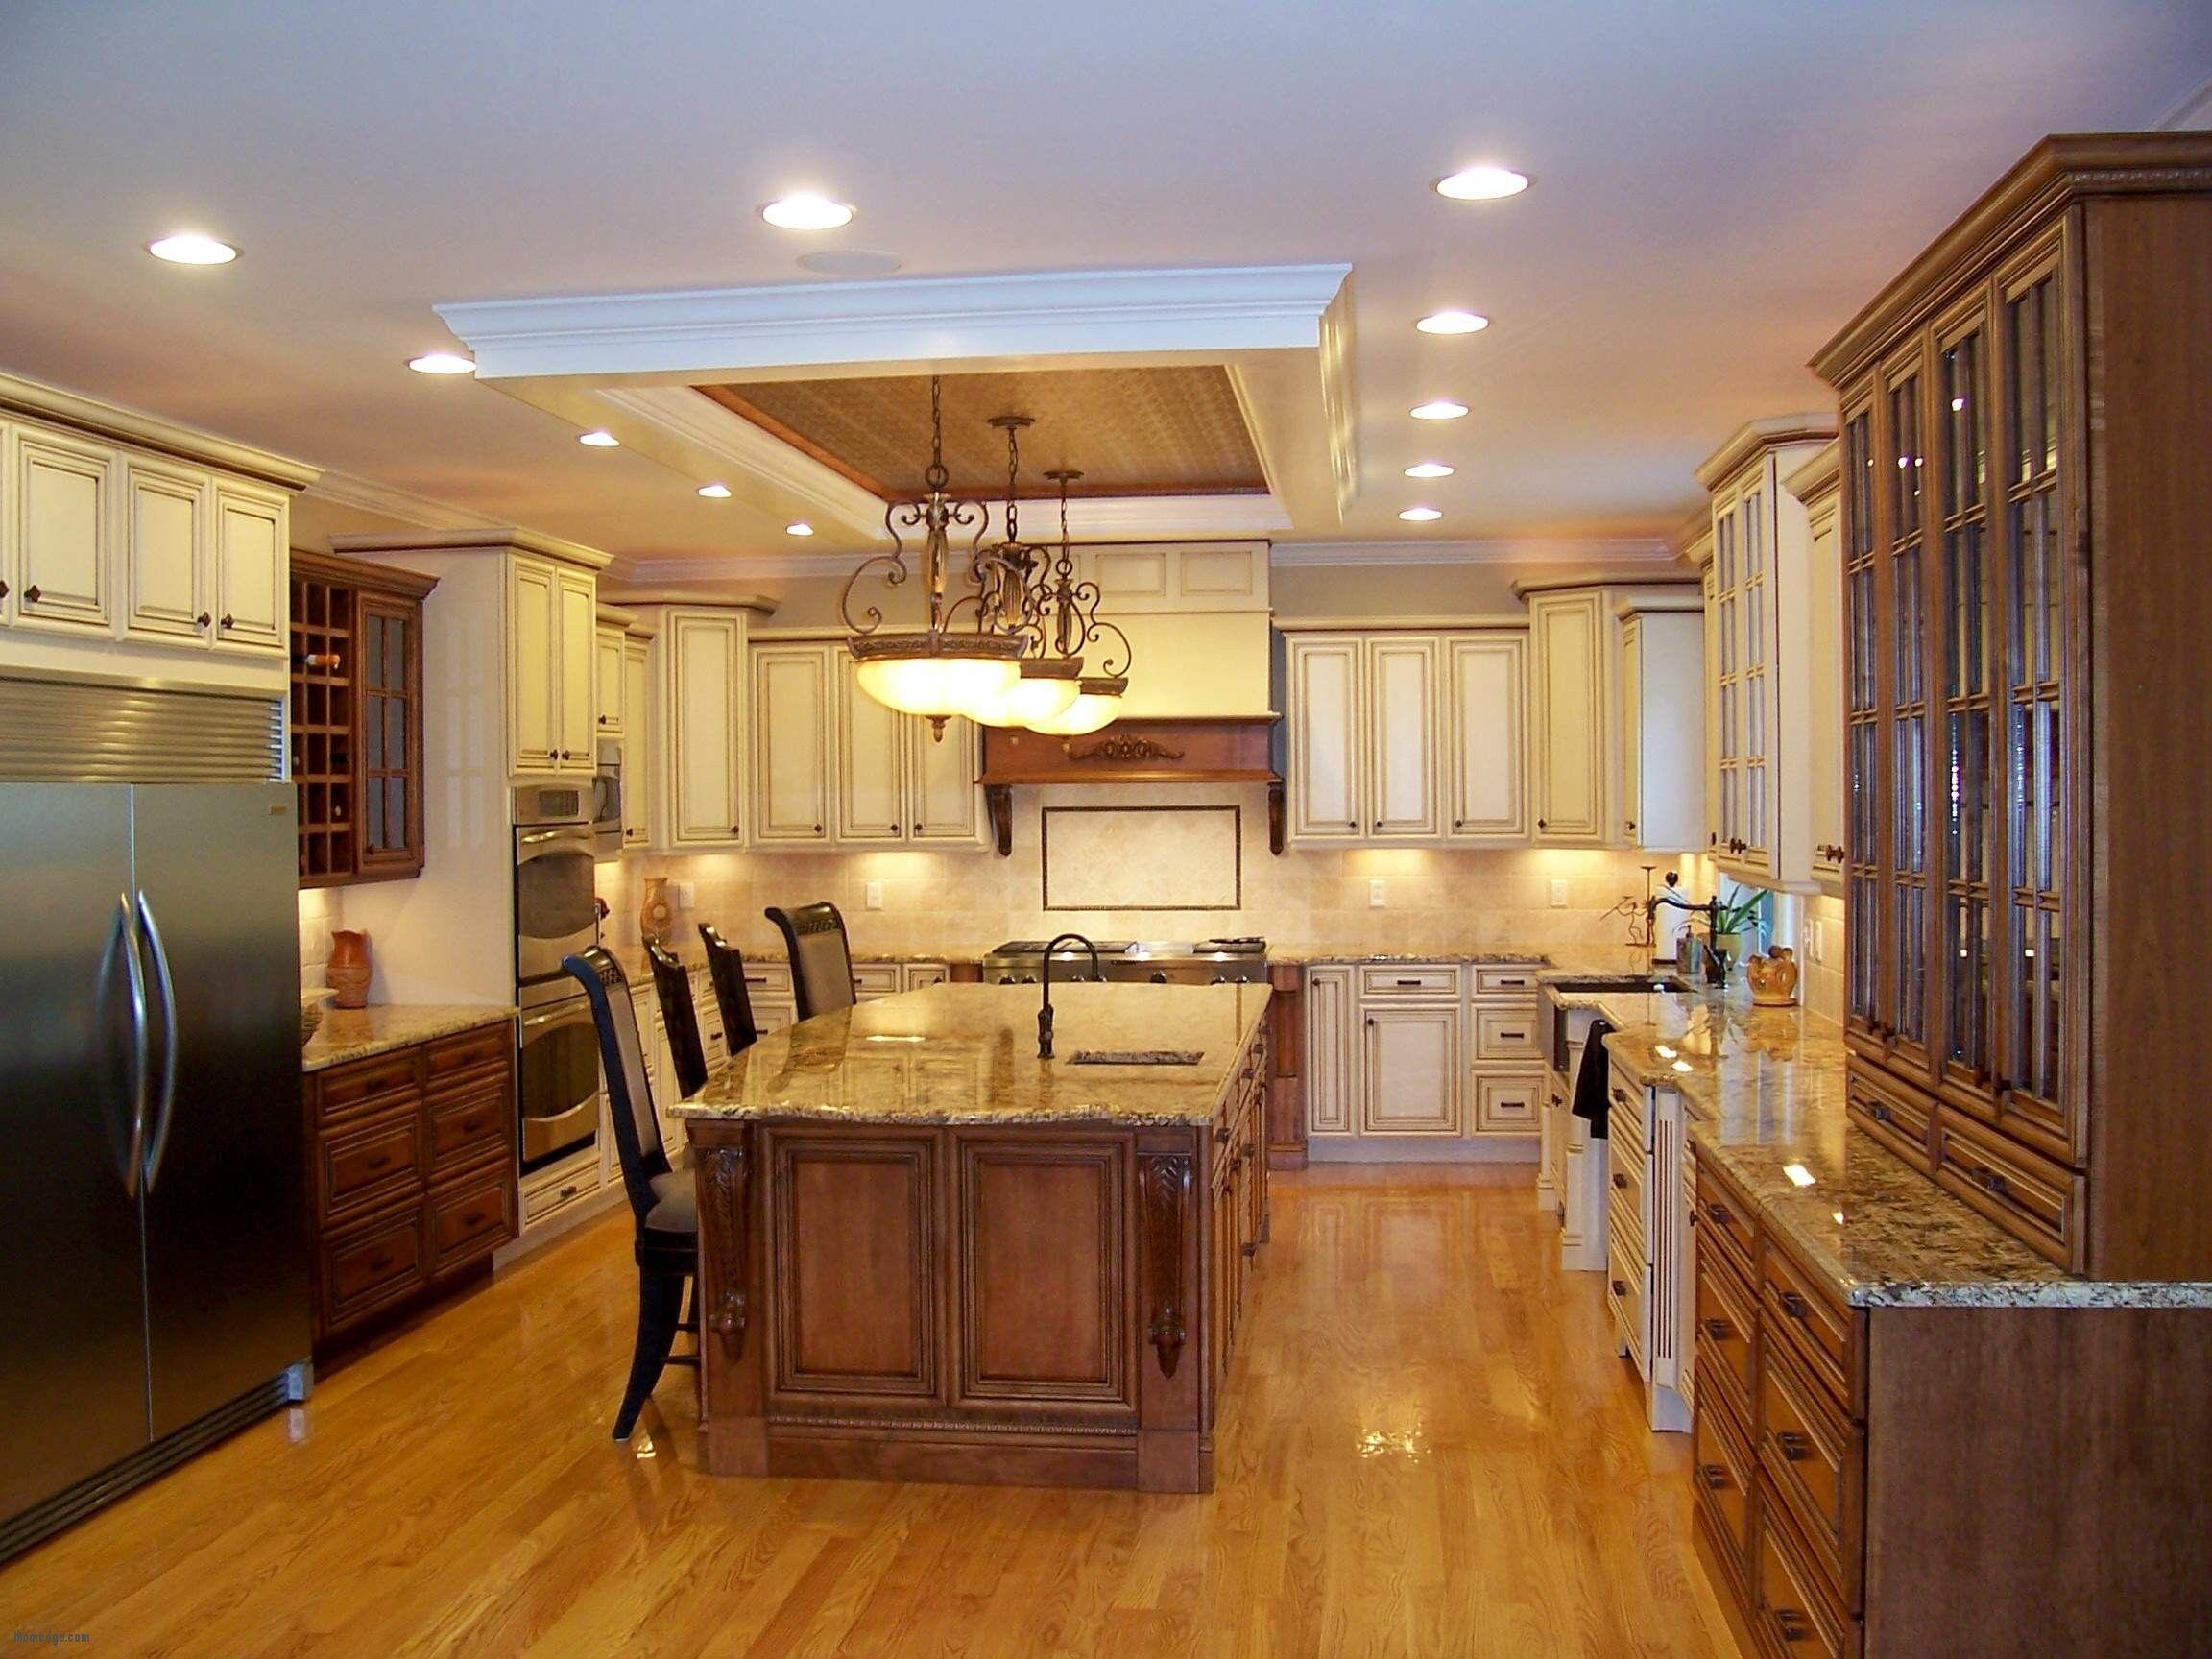 awesome Wonderful Kitchen Layout , awesome